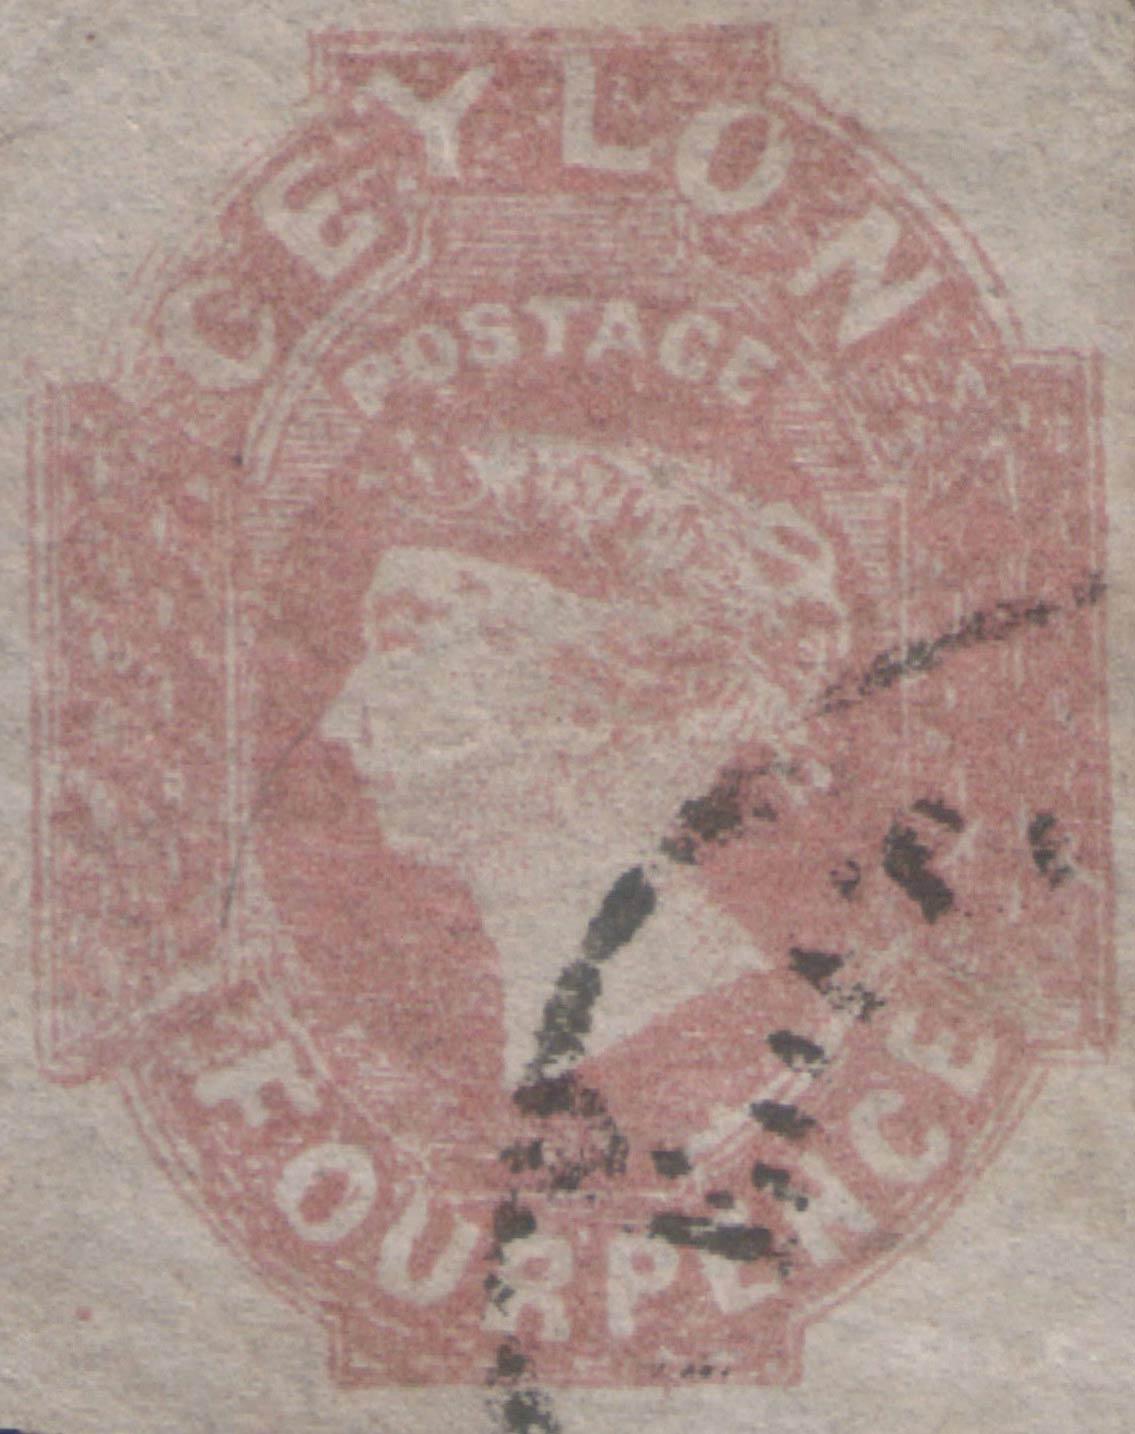 Ceylon_1859_QV_4p_Forgery3